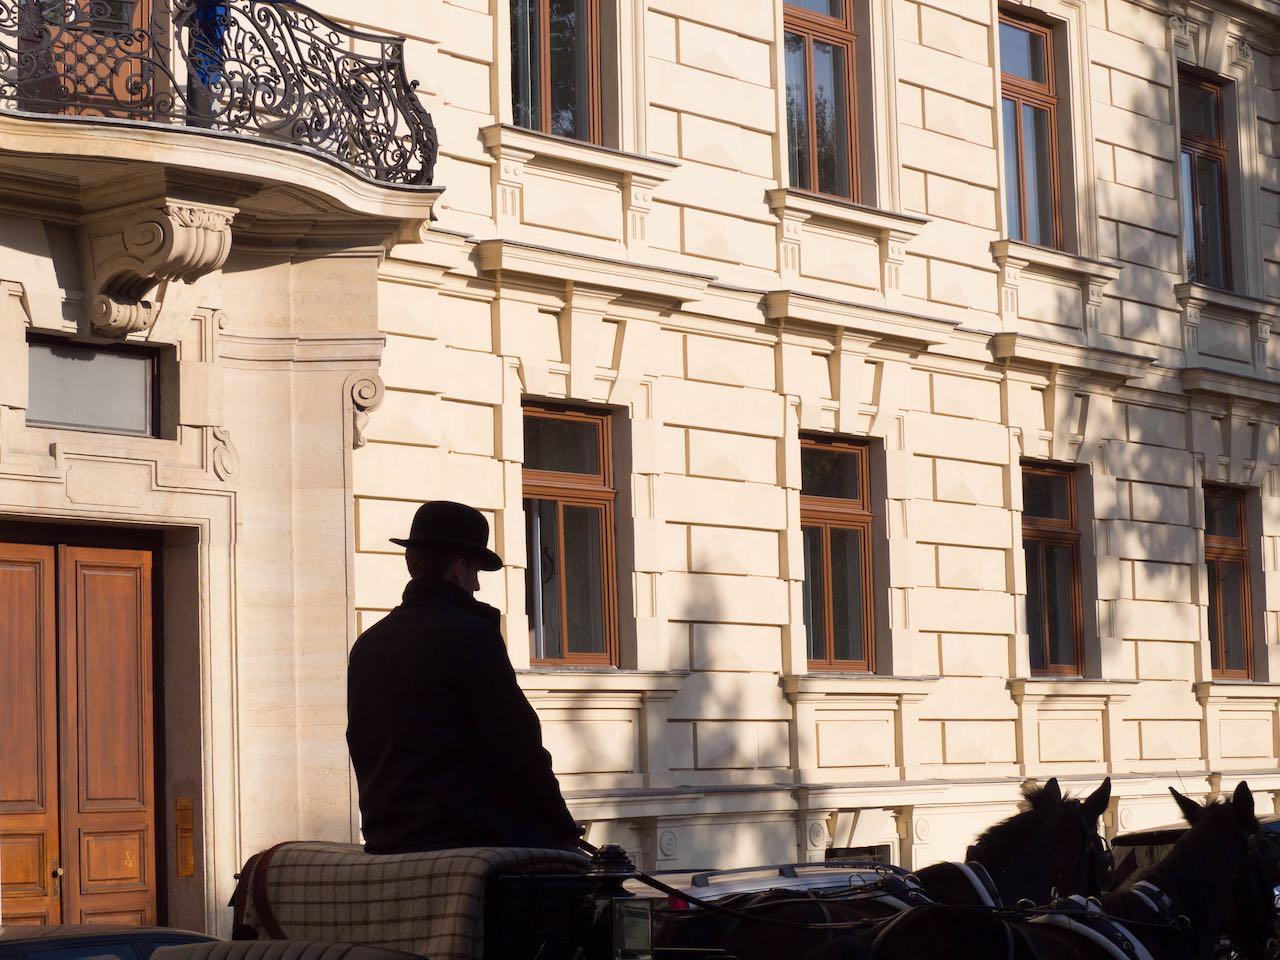 Horse-drawn Carriage Vienna